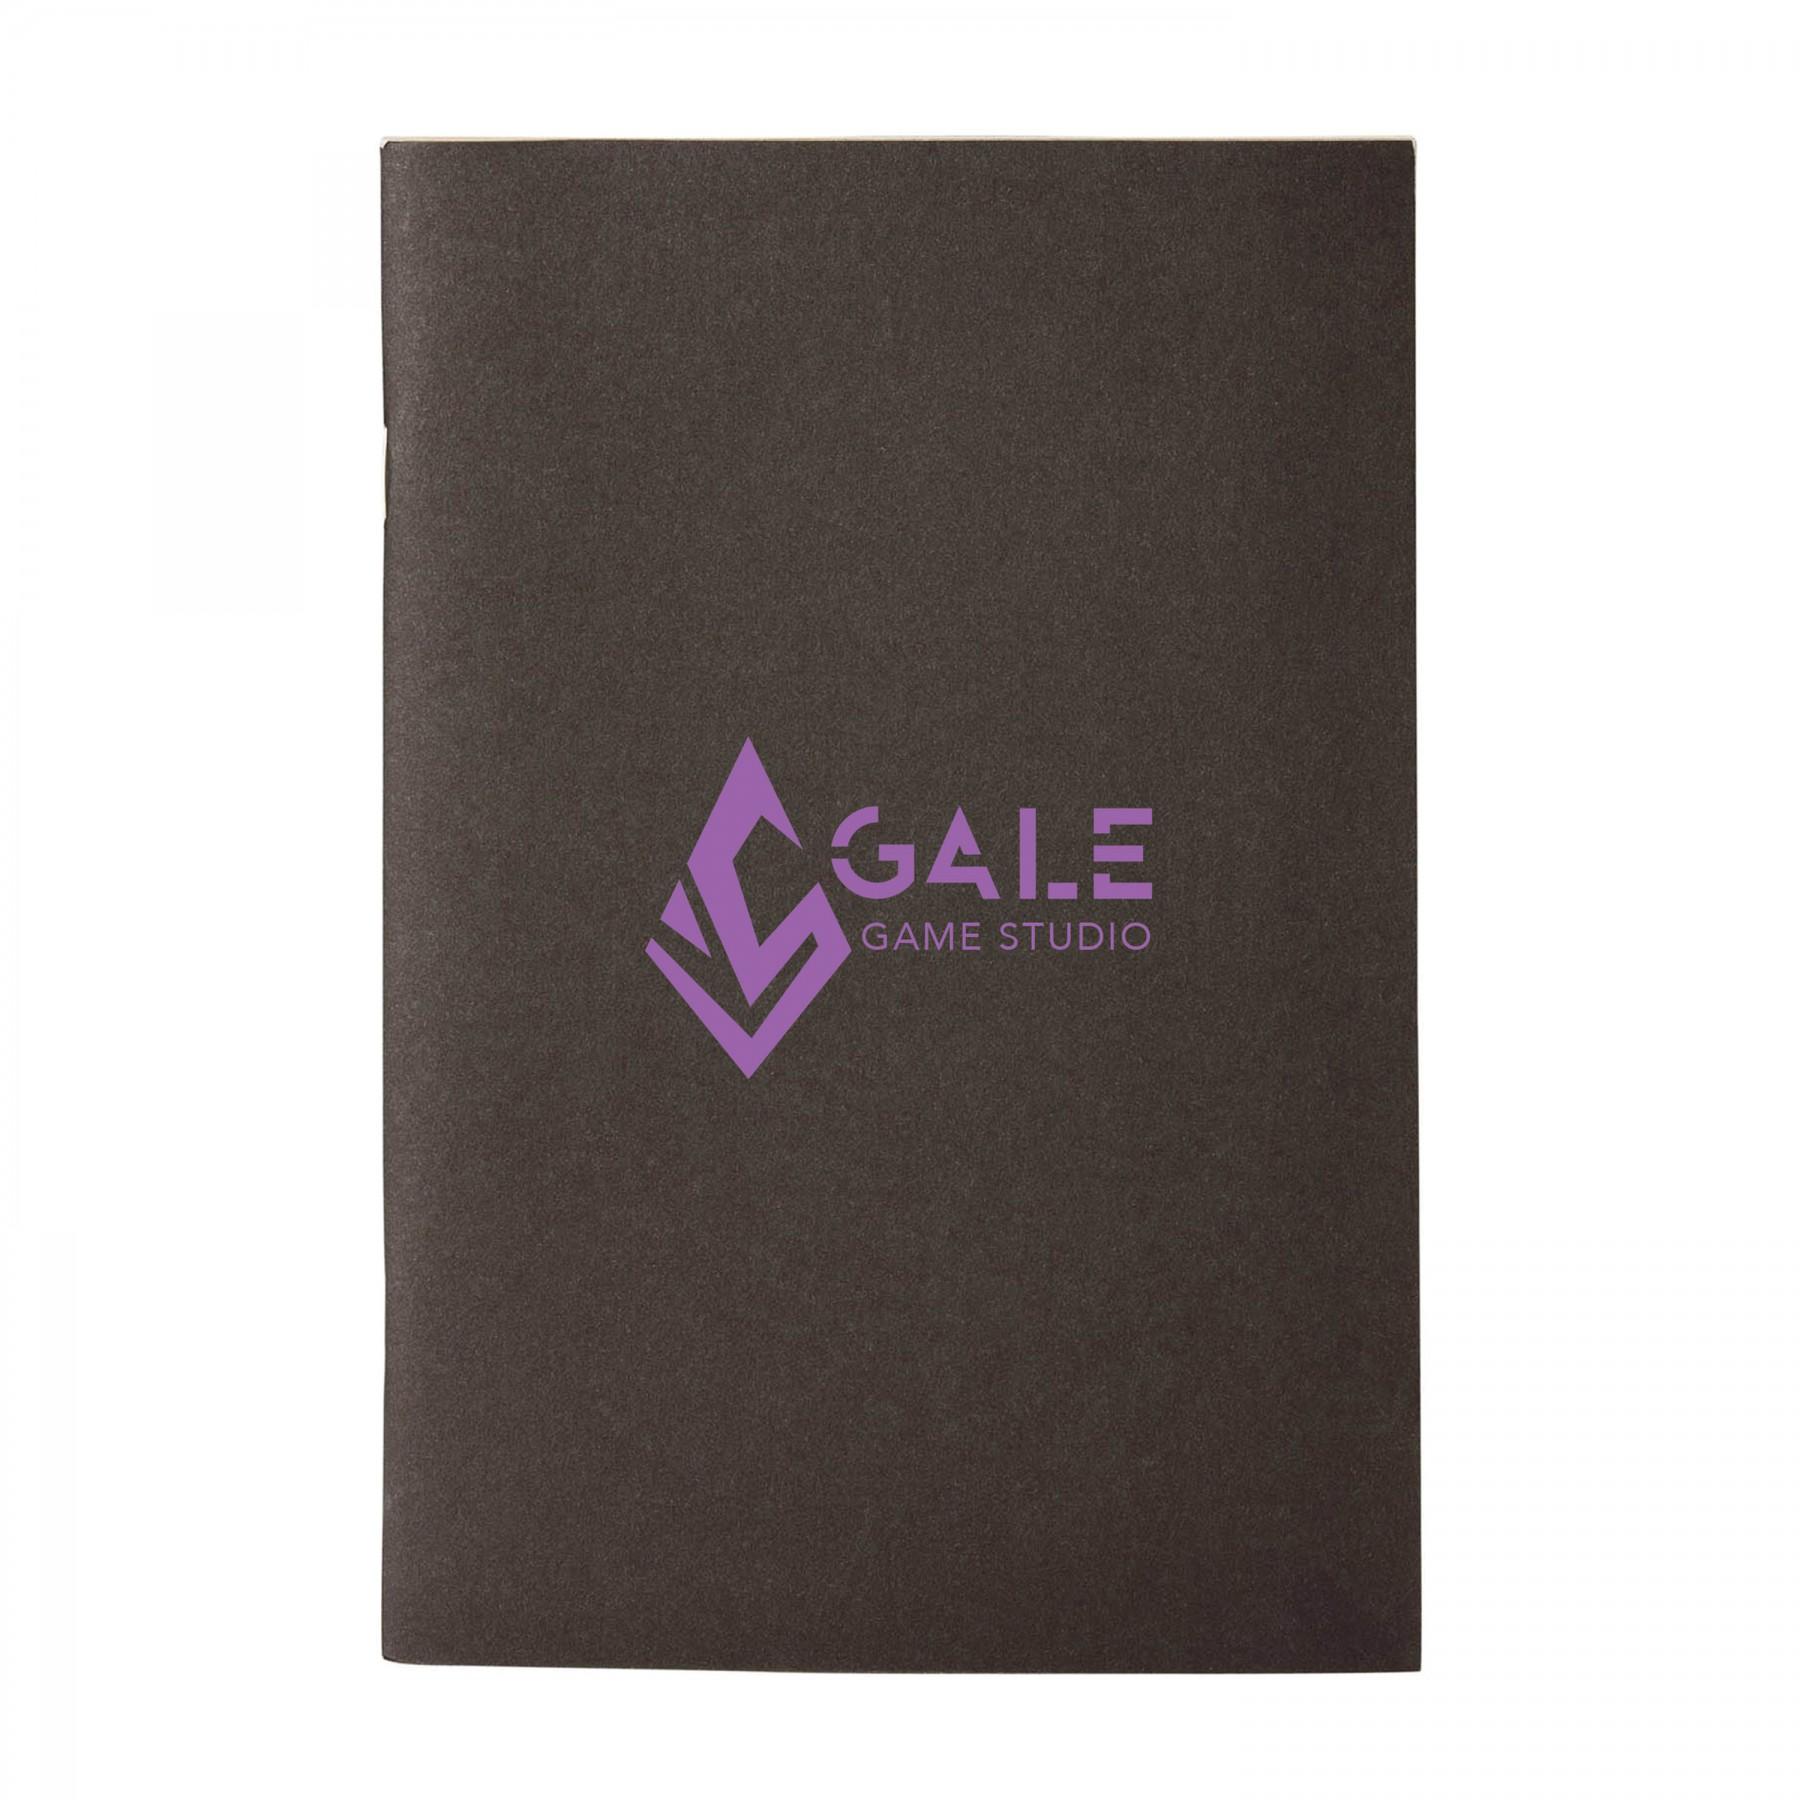 Saddle-Stitched Eco Notebook, EC3021, 1 Colour Imprint